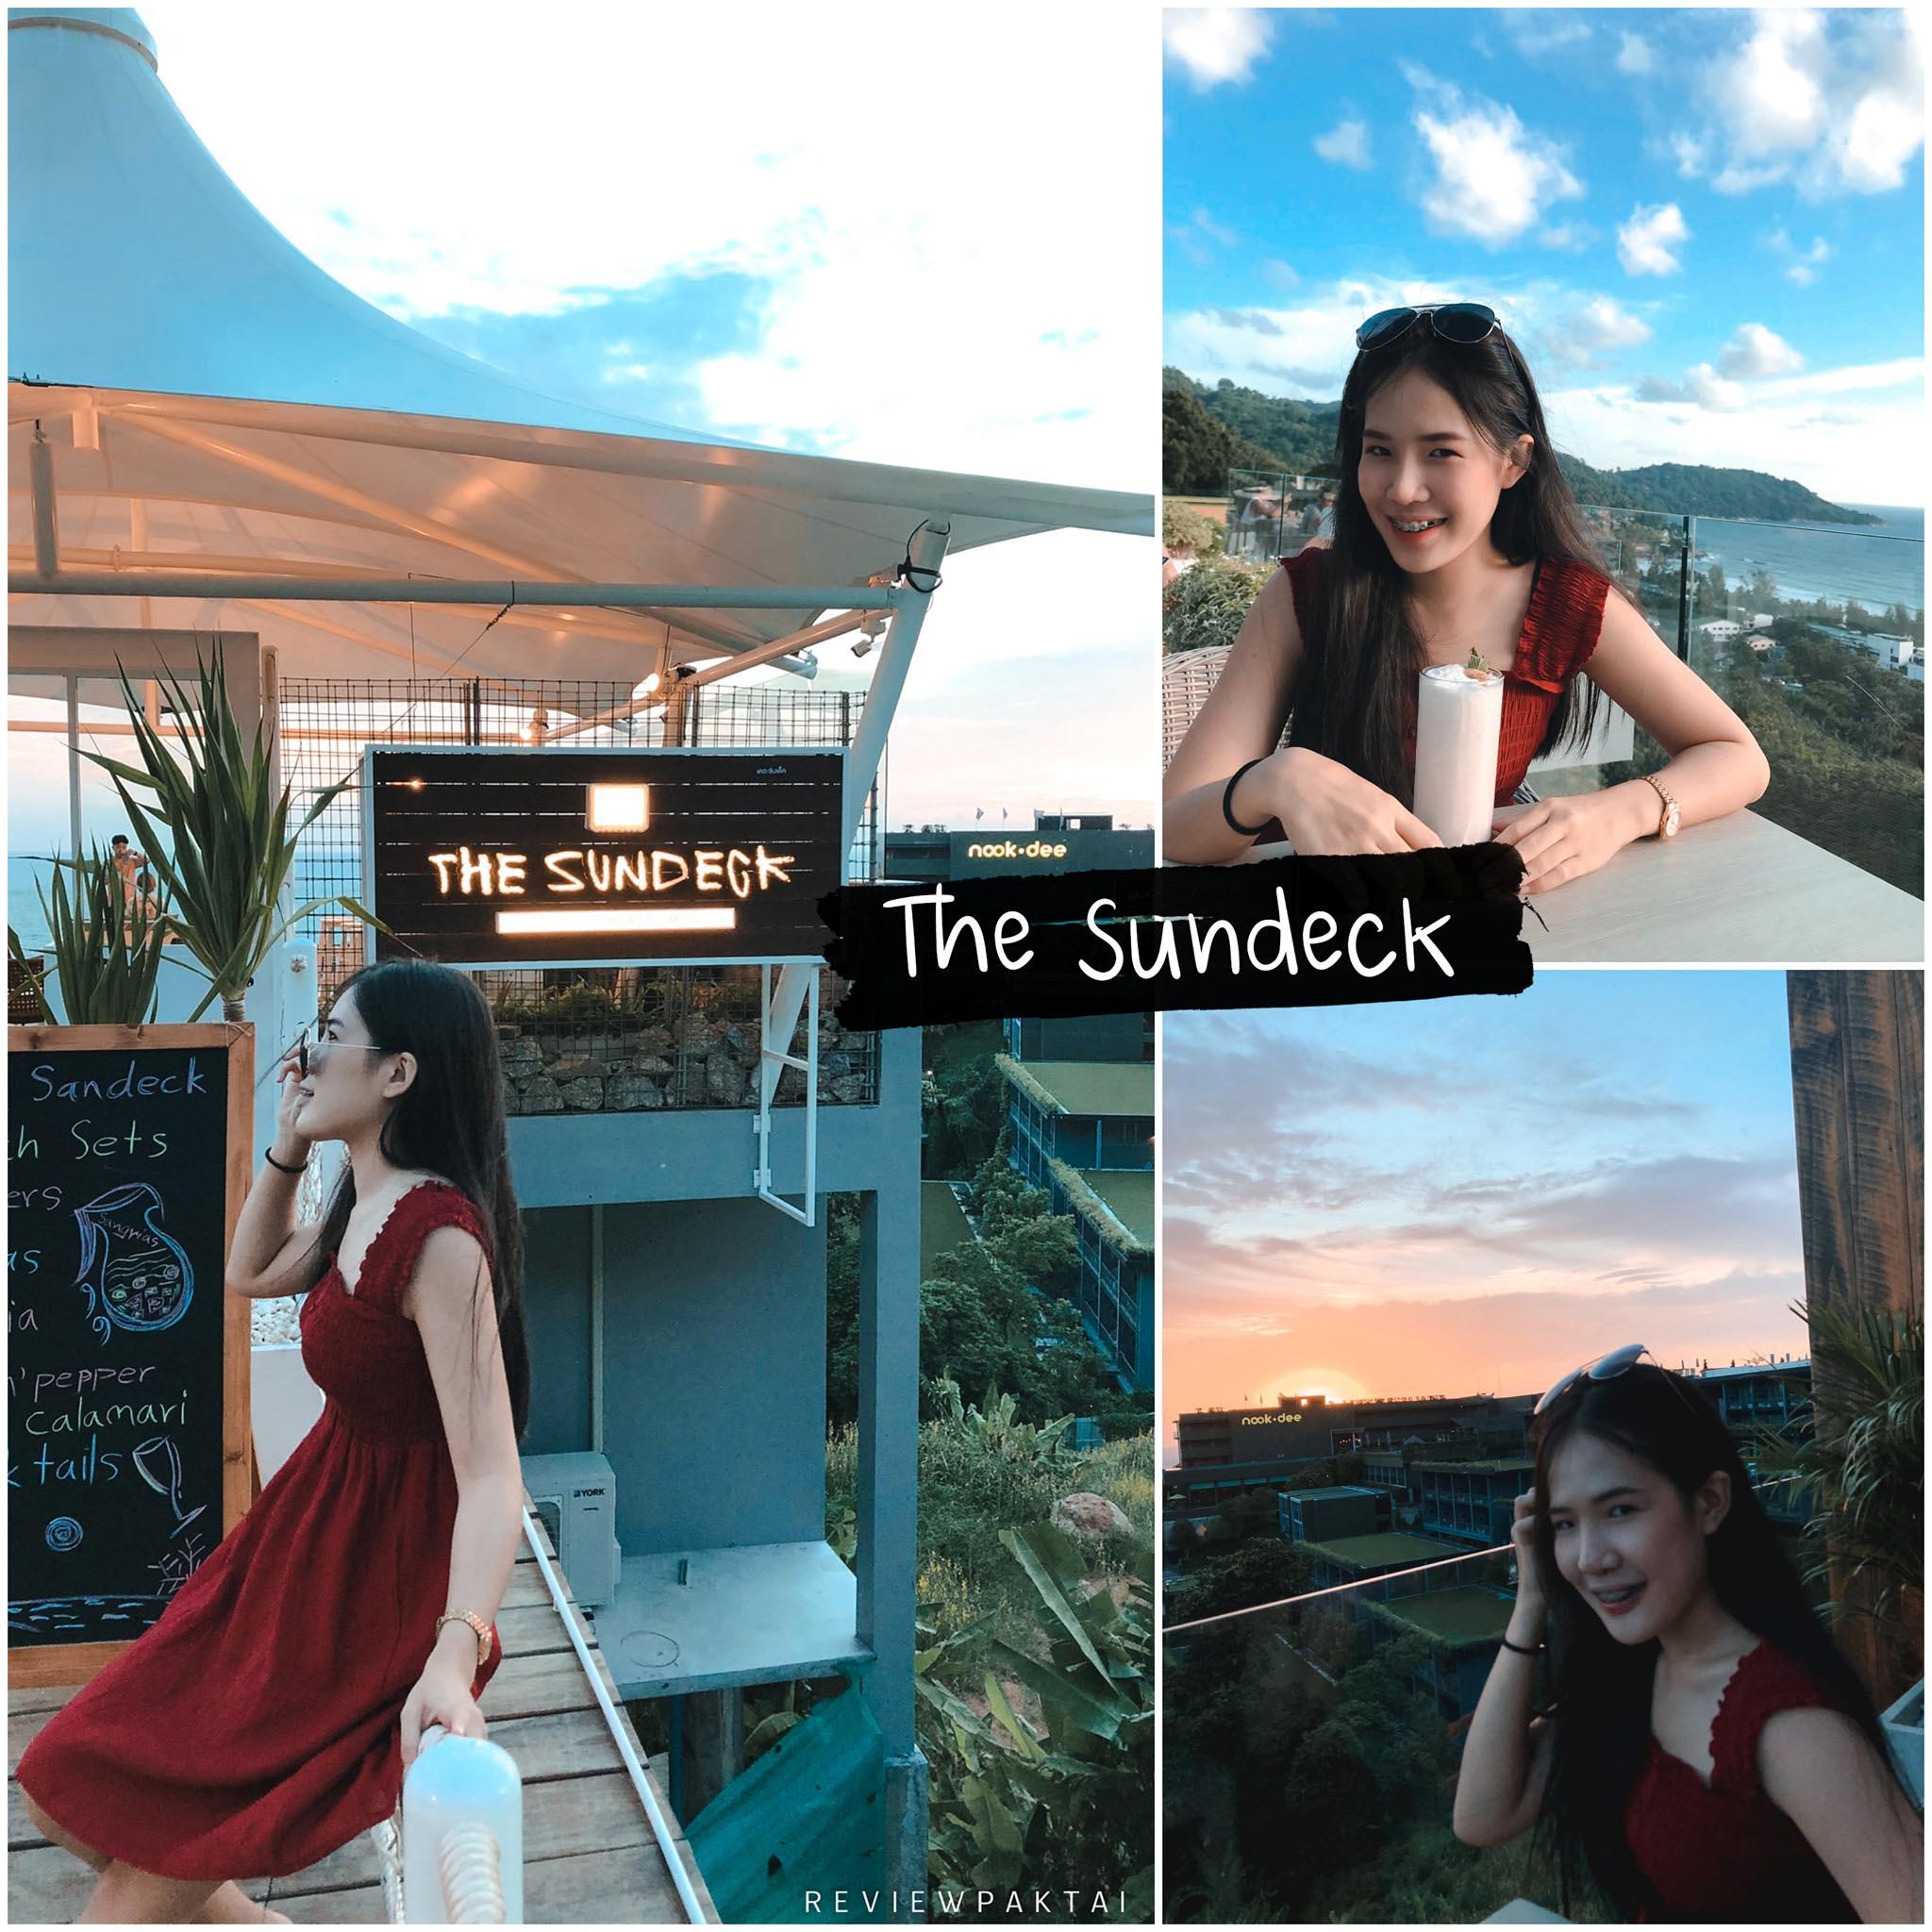 The-Sundeck คาเฟ่ภูเก็ต-ร้านสวยๆ-สไตล์มินิมอลบนเขาวิวทะเลปังๆ-ต้องไปเช็คอินกันเน้อ ภูเก็ต,คาเฟ่,ที่เที่ยว,ร้านกาแฟ,เด็ด,อร่อย,ต้องลอง